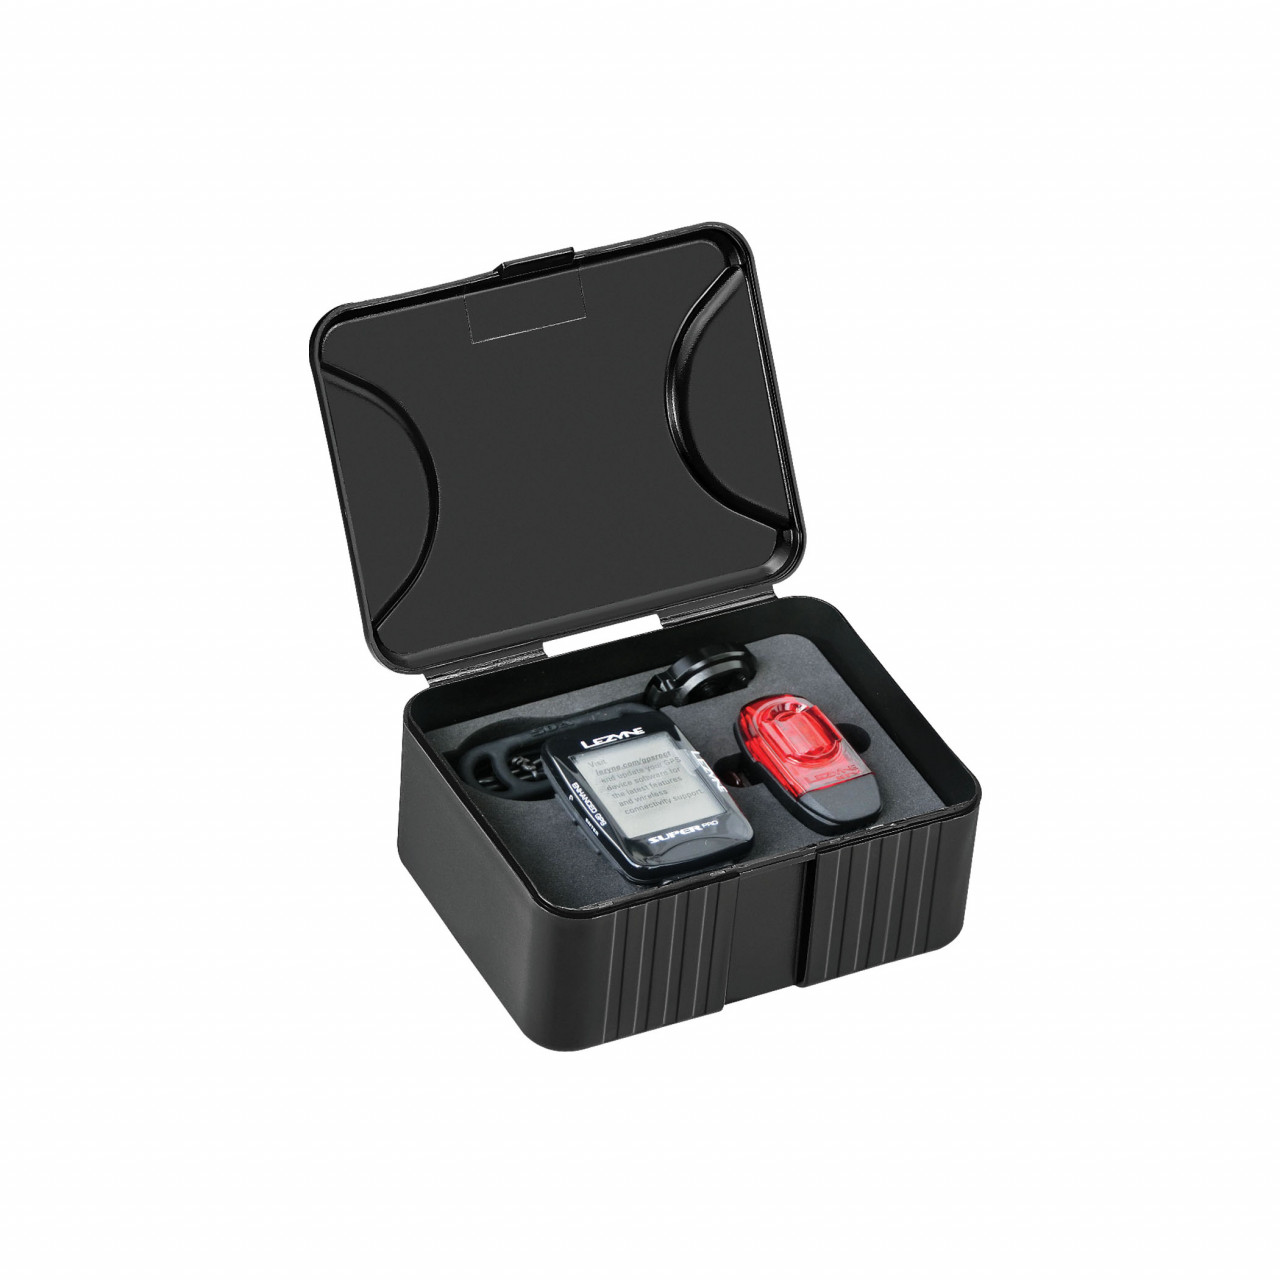 Lezyne cyklocomputer SUPER PRO GPS SMART LOADED